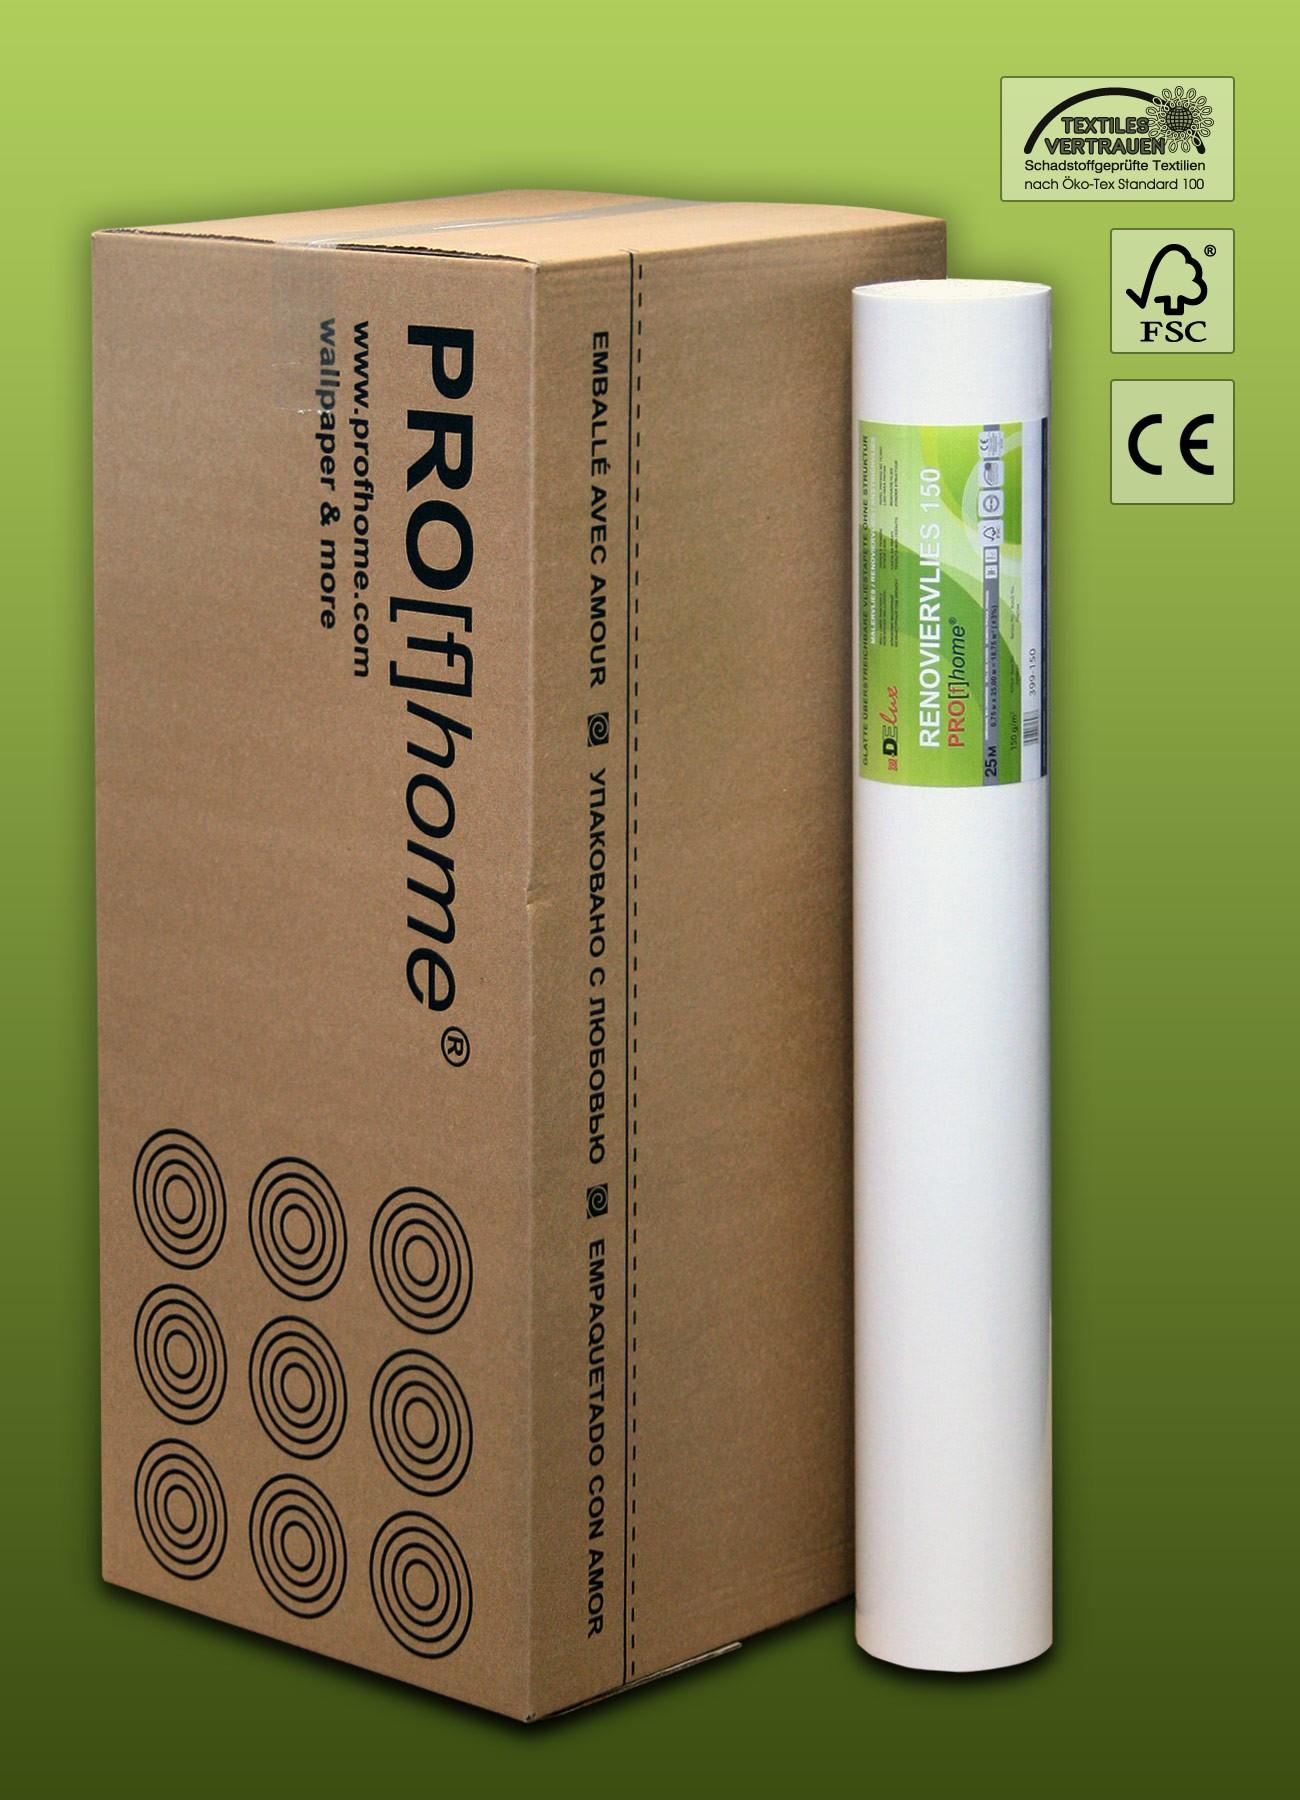 fibre de r novation non tiss peindre 150 g profhome 399 150 intiss de lissage professionnel. Black Bedroom Furniture Sets. Home Design Ideas